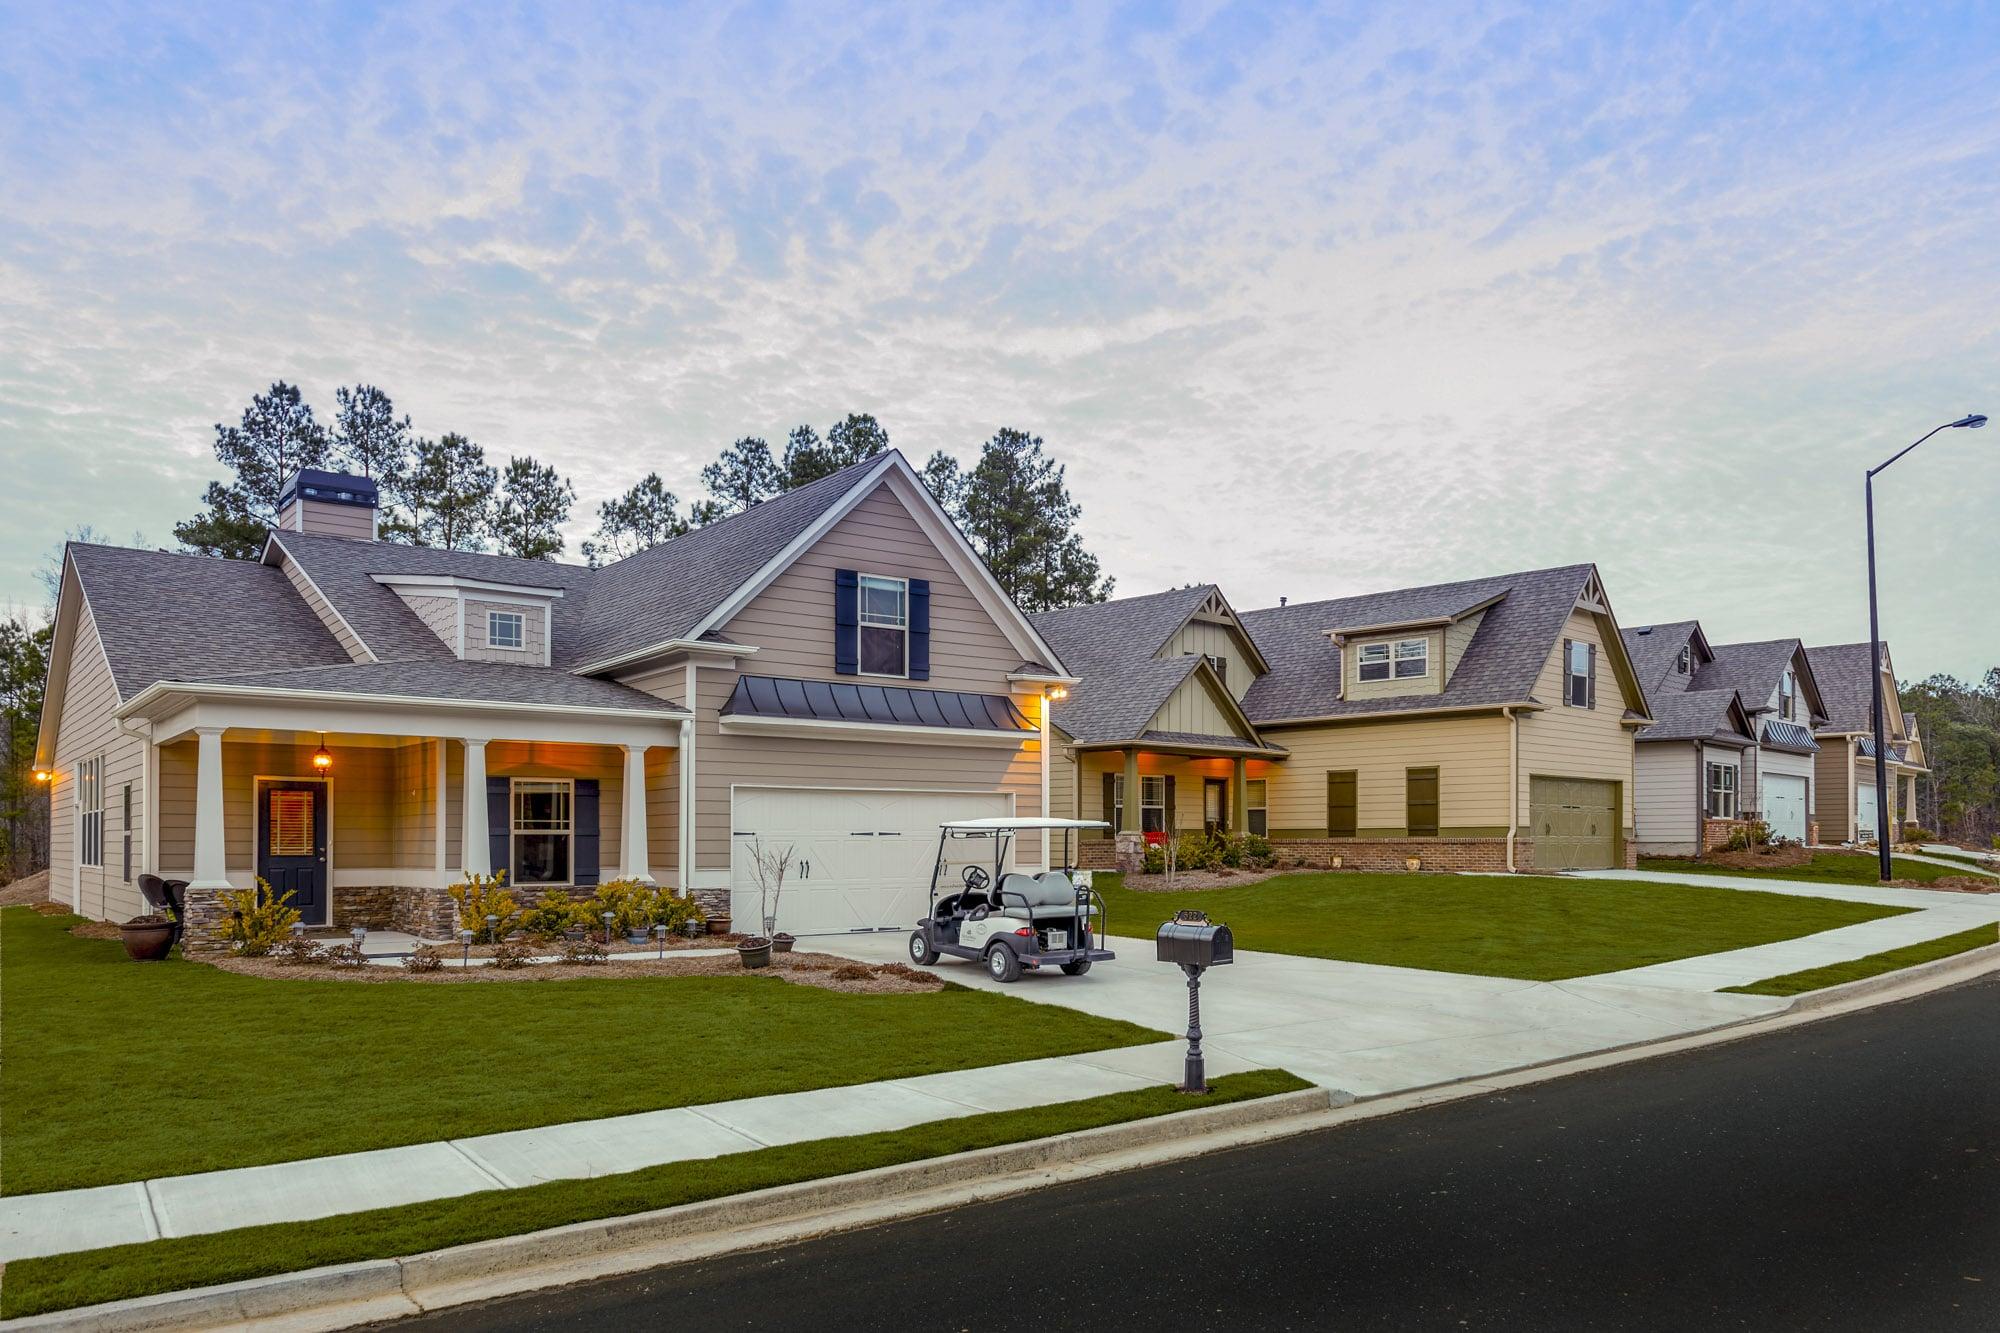 Artisan Built Communities: Homes that Blend the Best of Man, Nature